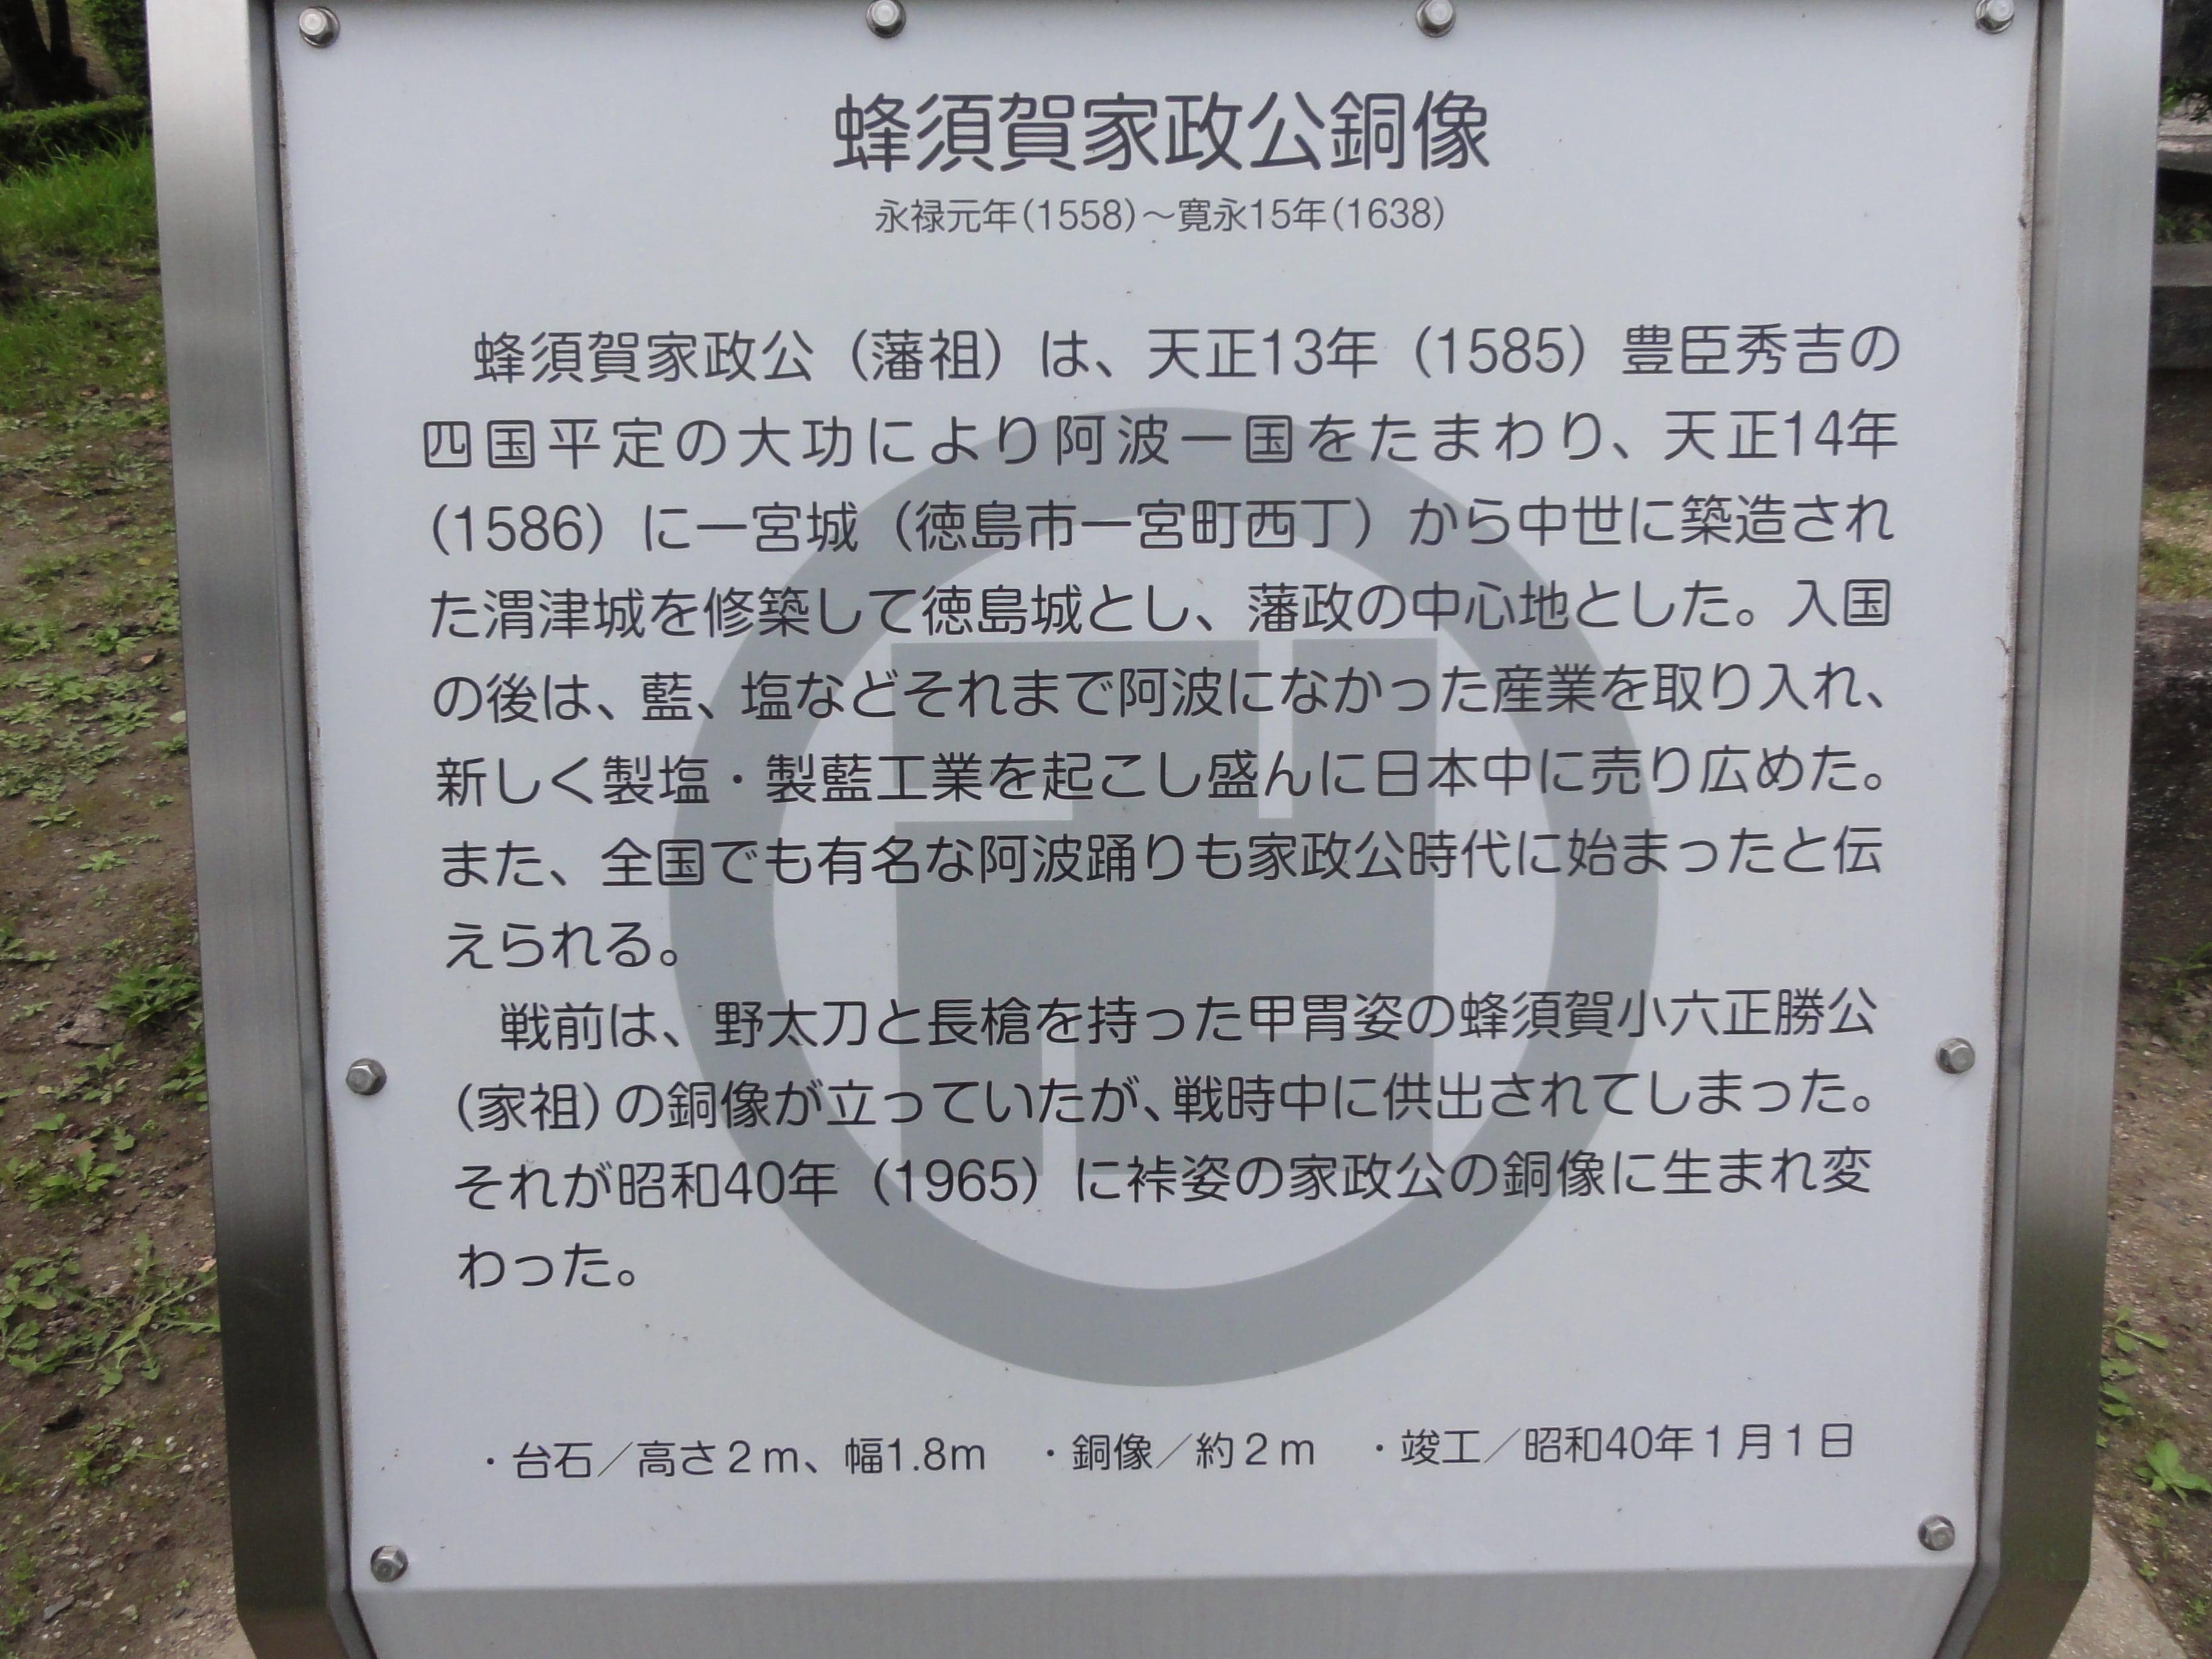 蜂須賀家政公銅像の説明